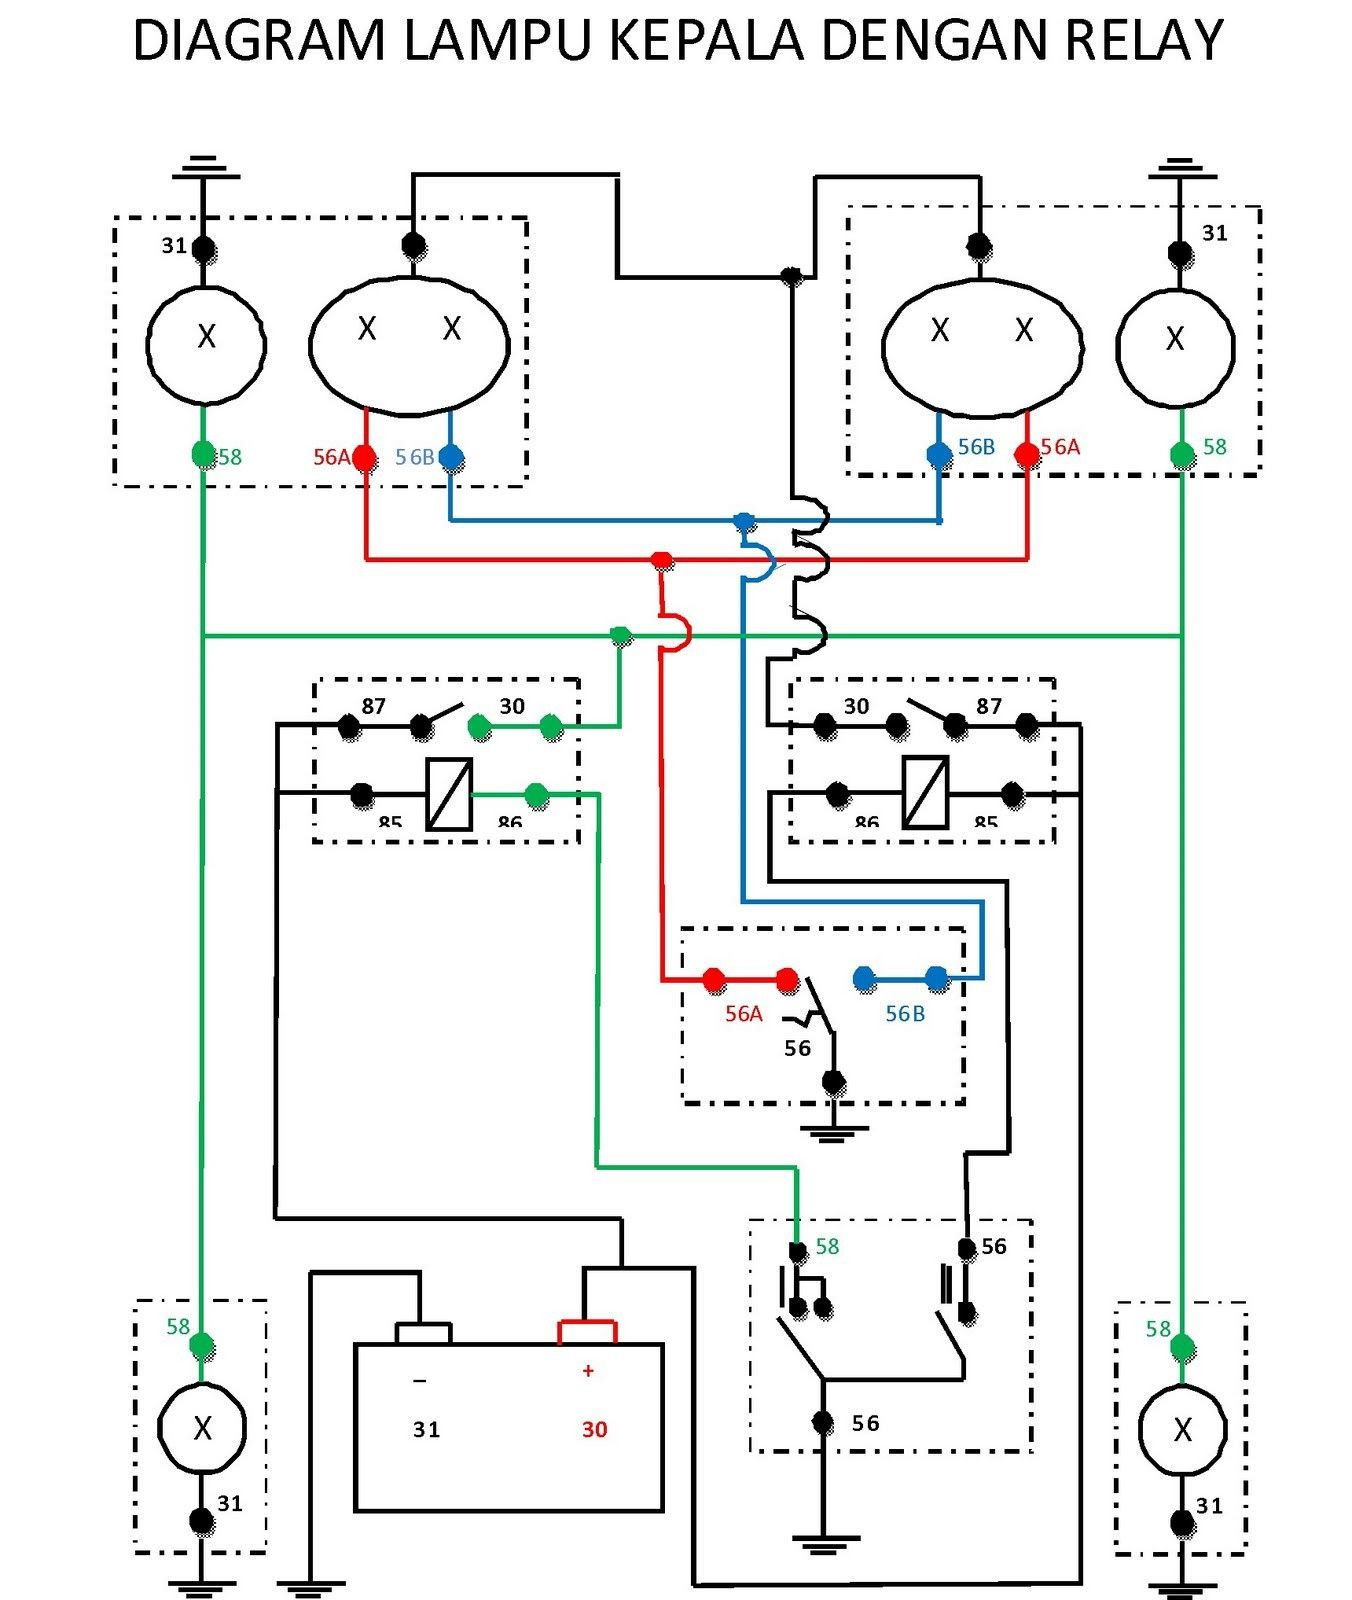 wiring diagram daihatsu xenia schema wiring diagram en 2020